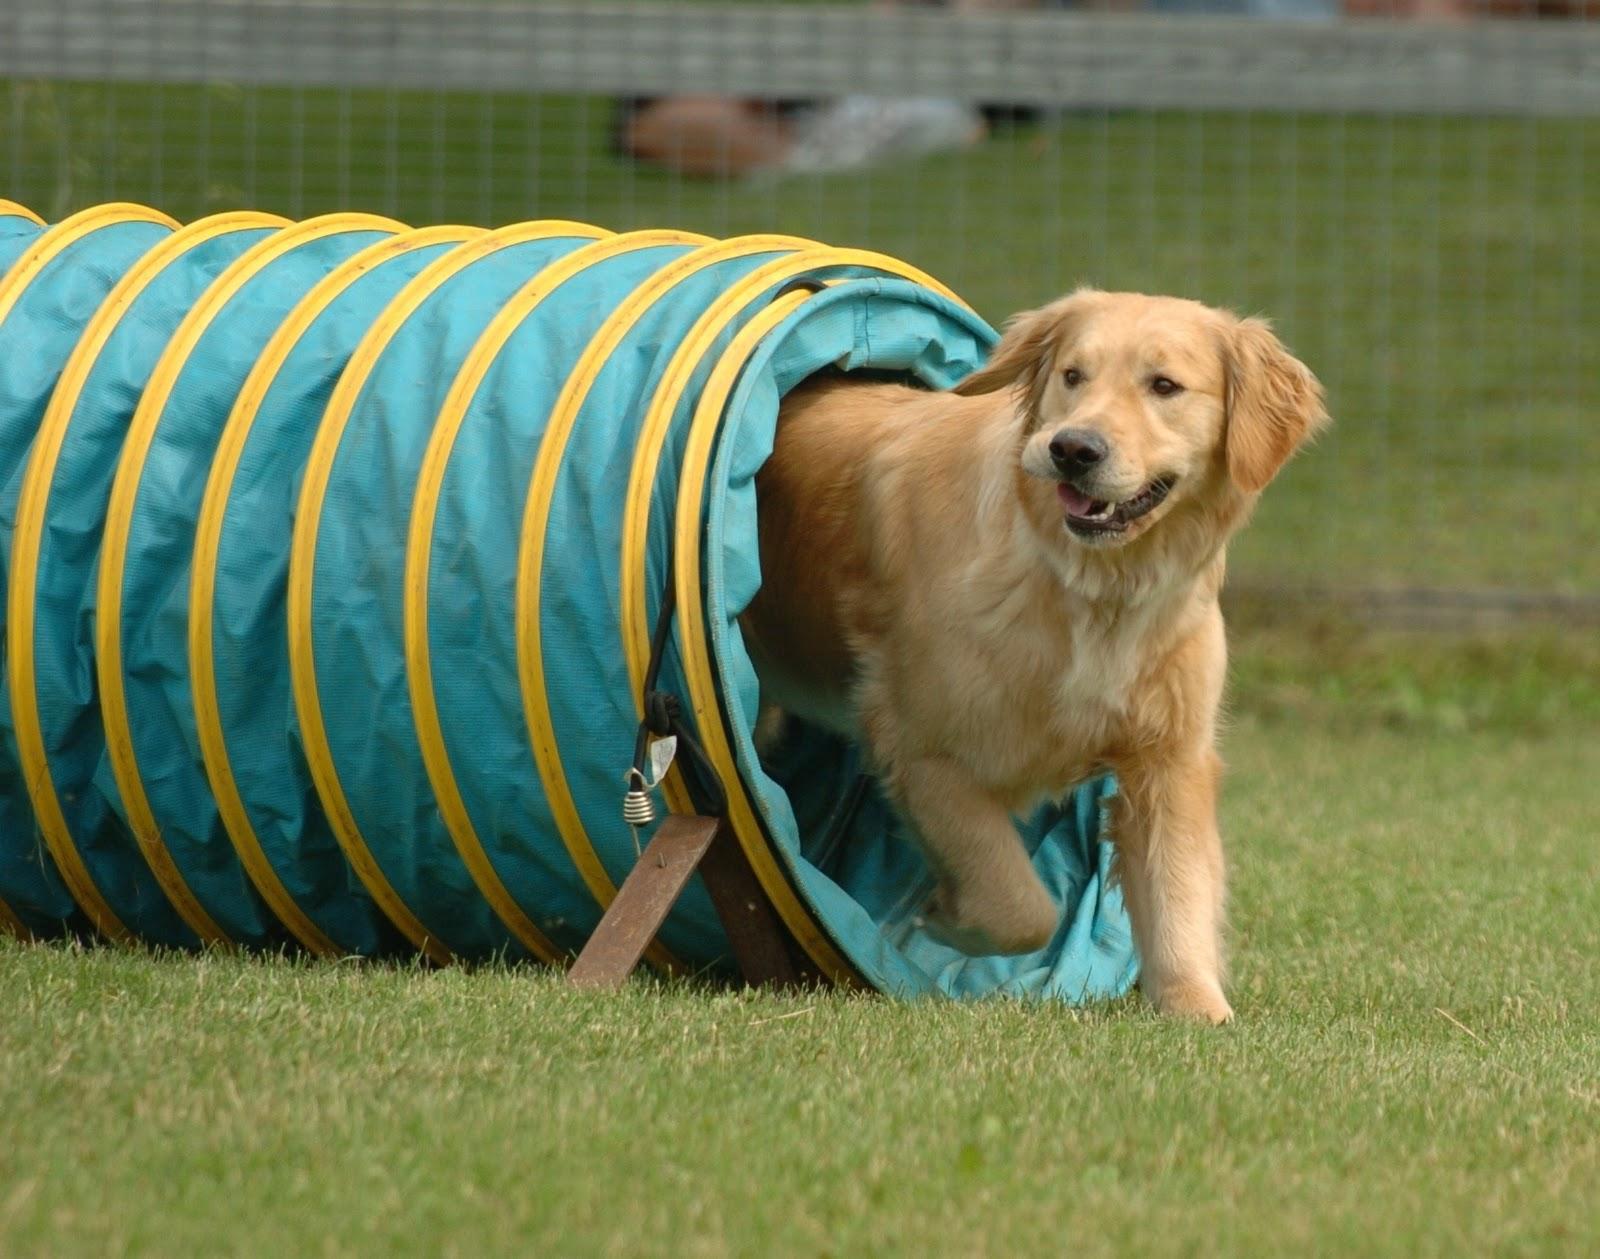 Dog Training The Agility